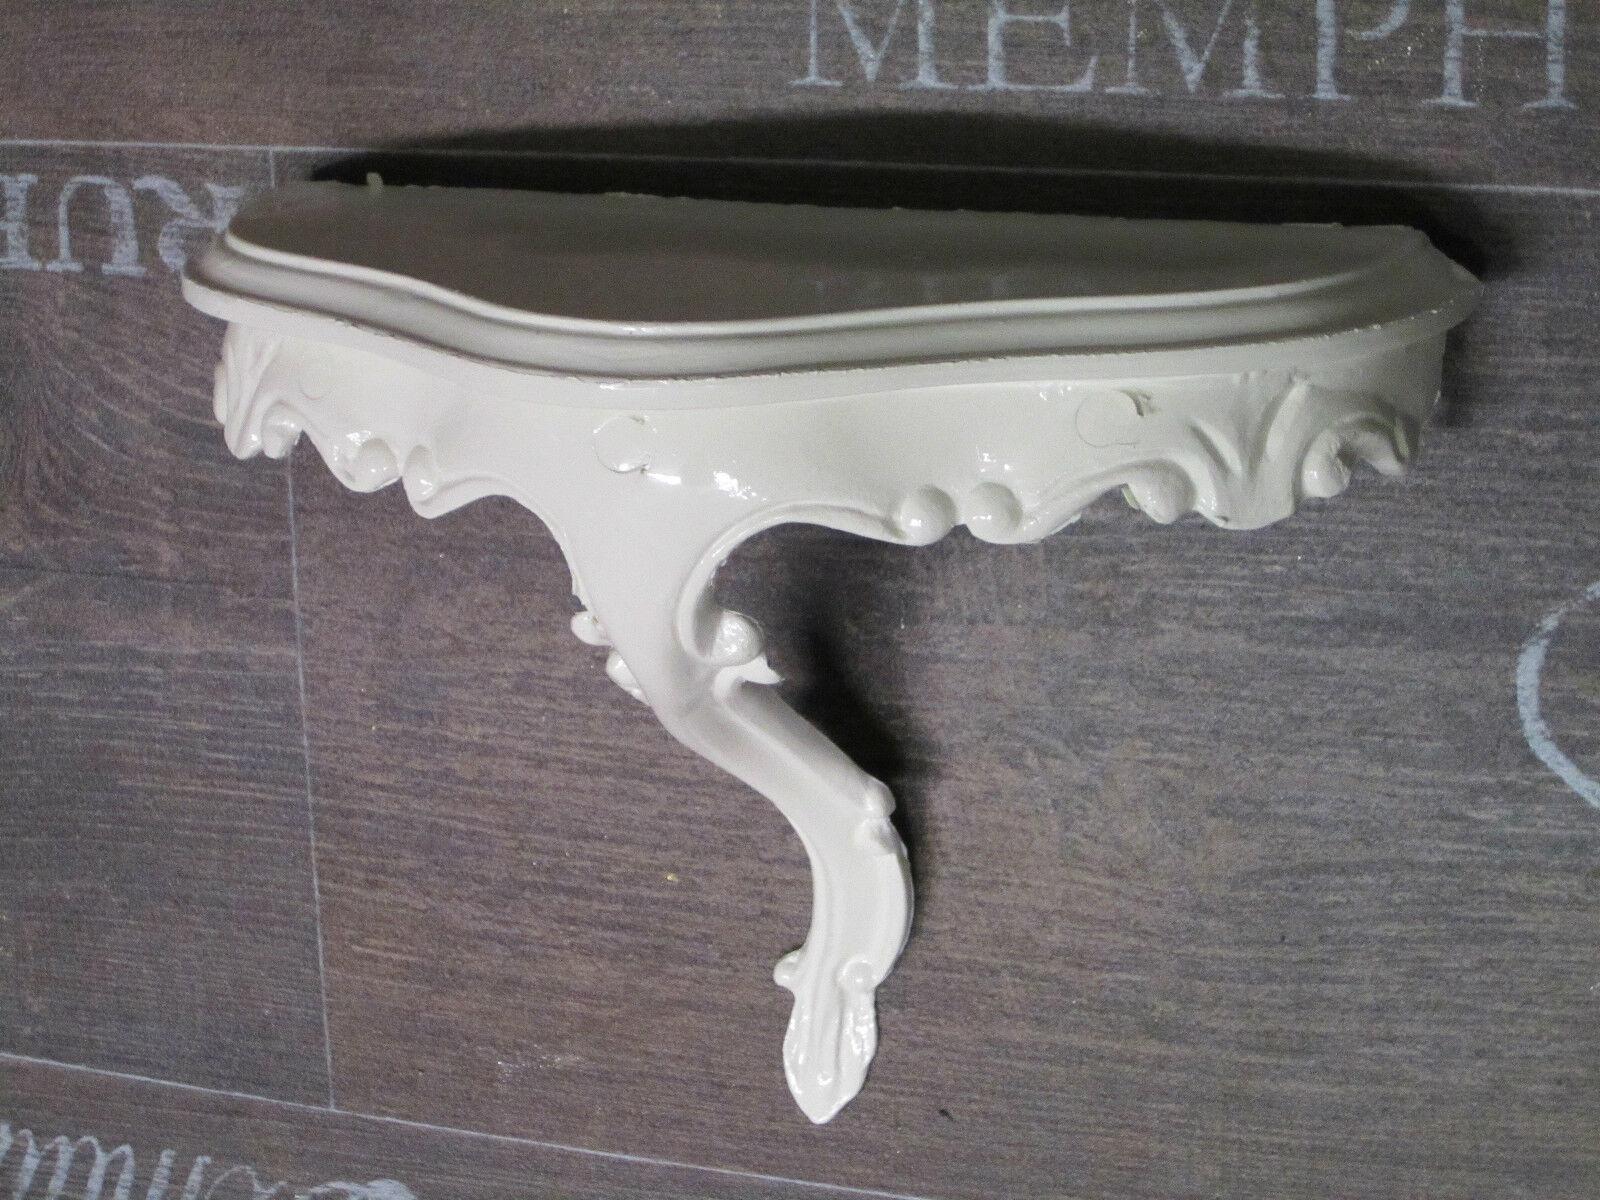 mini console murale console blanc repro baroque 23 5x10x18cm miroir mural 1 ebay. Black Bedroom Furniture Sets. Home Design Ideas